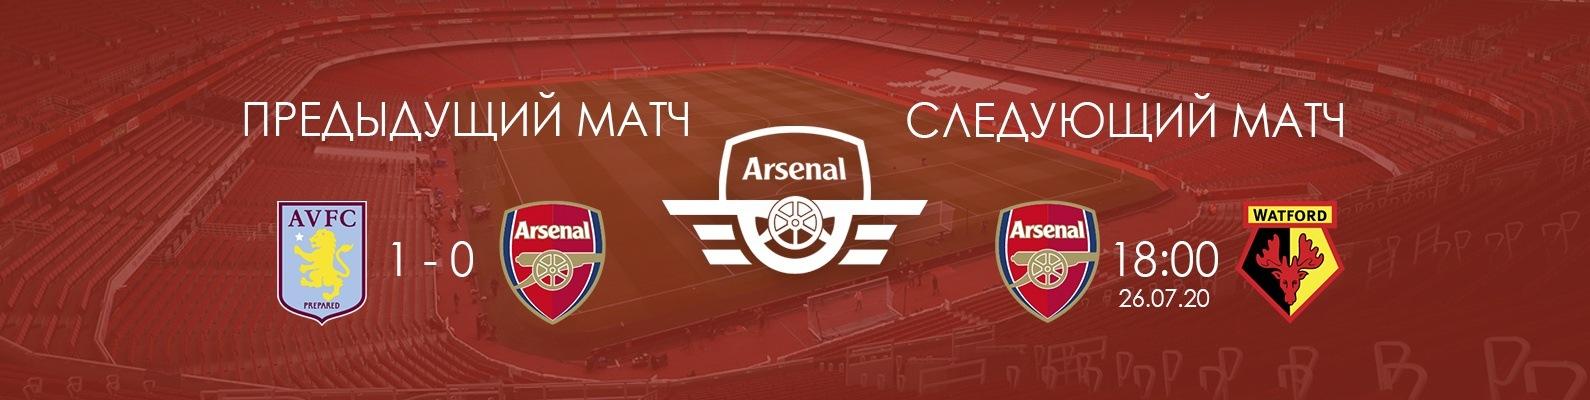 Арсенал лондон матчи в записи